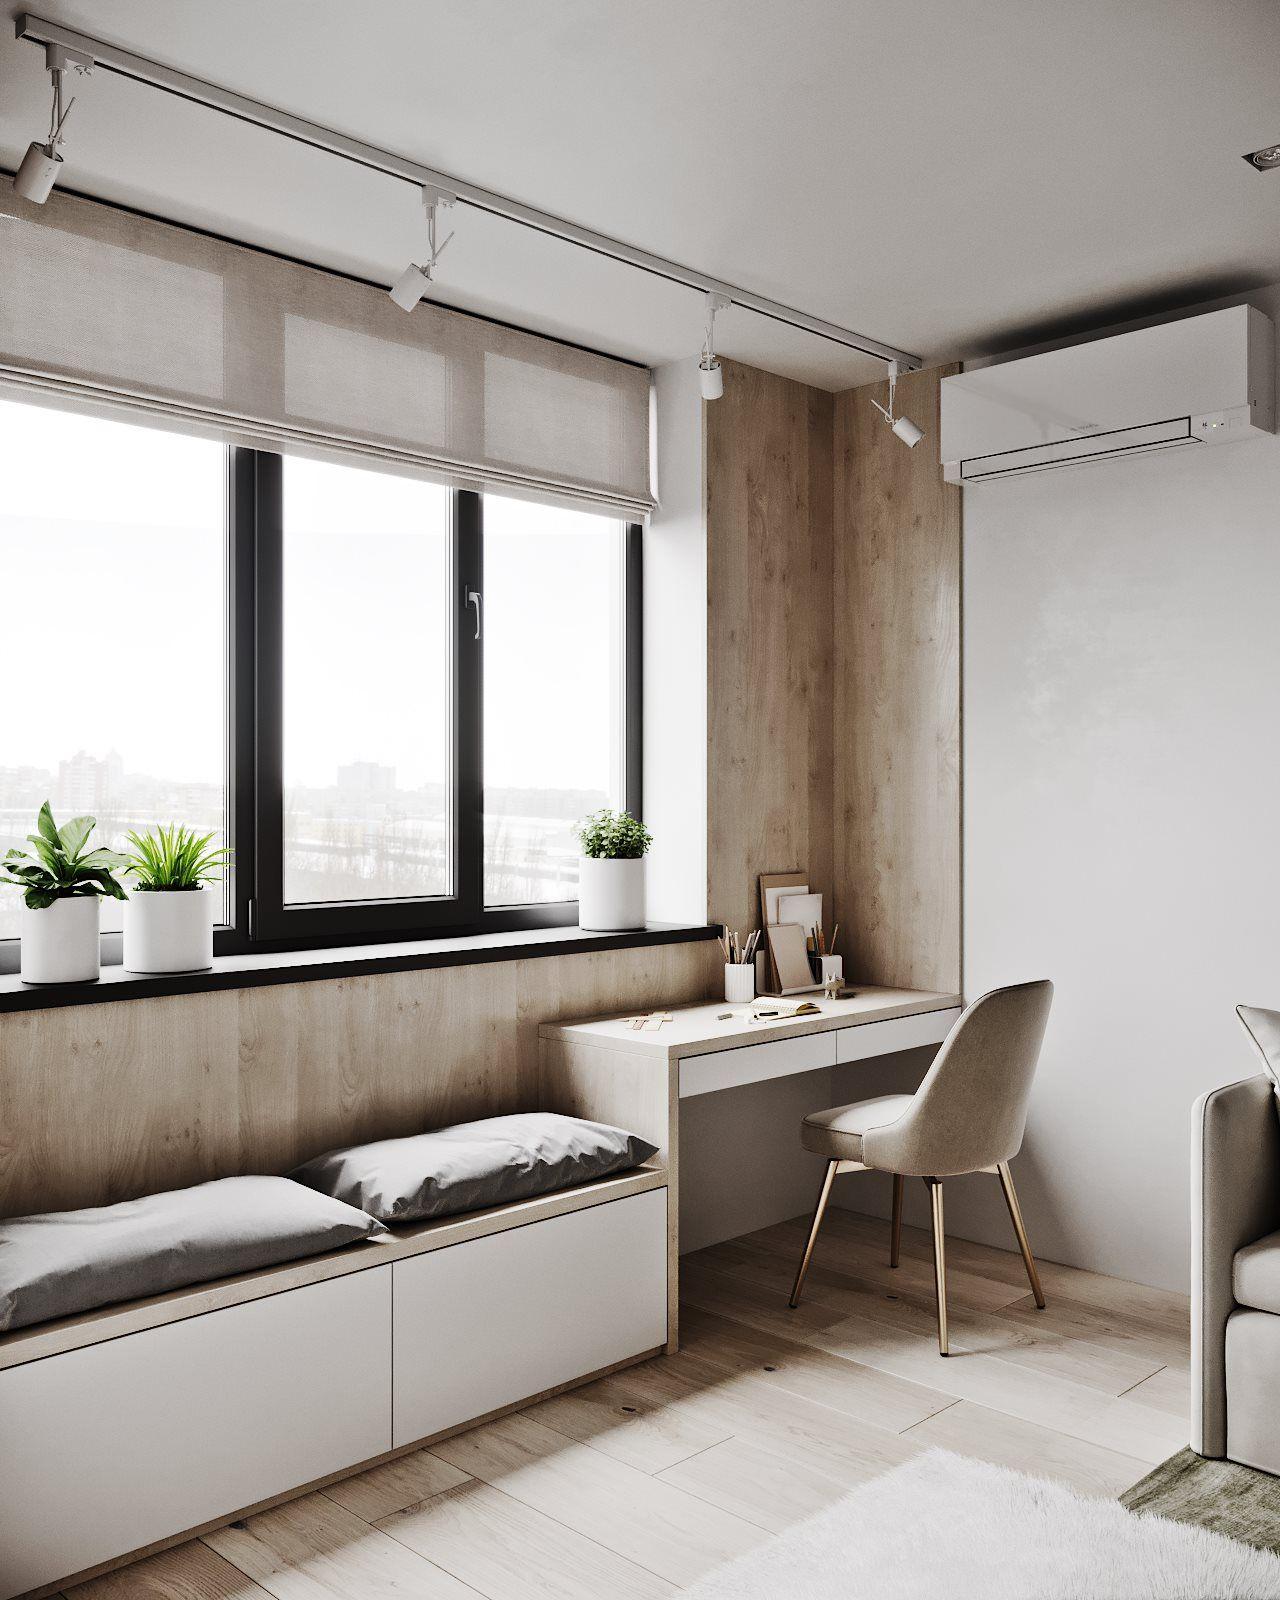 3d Room Interior Design: Apartment Interior Design Image By Maugo On Workplace